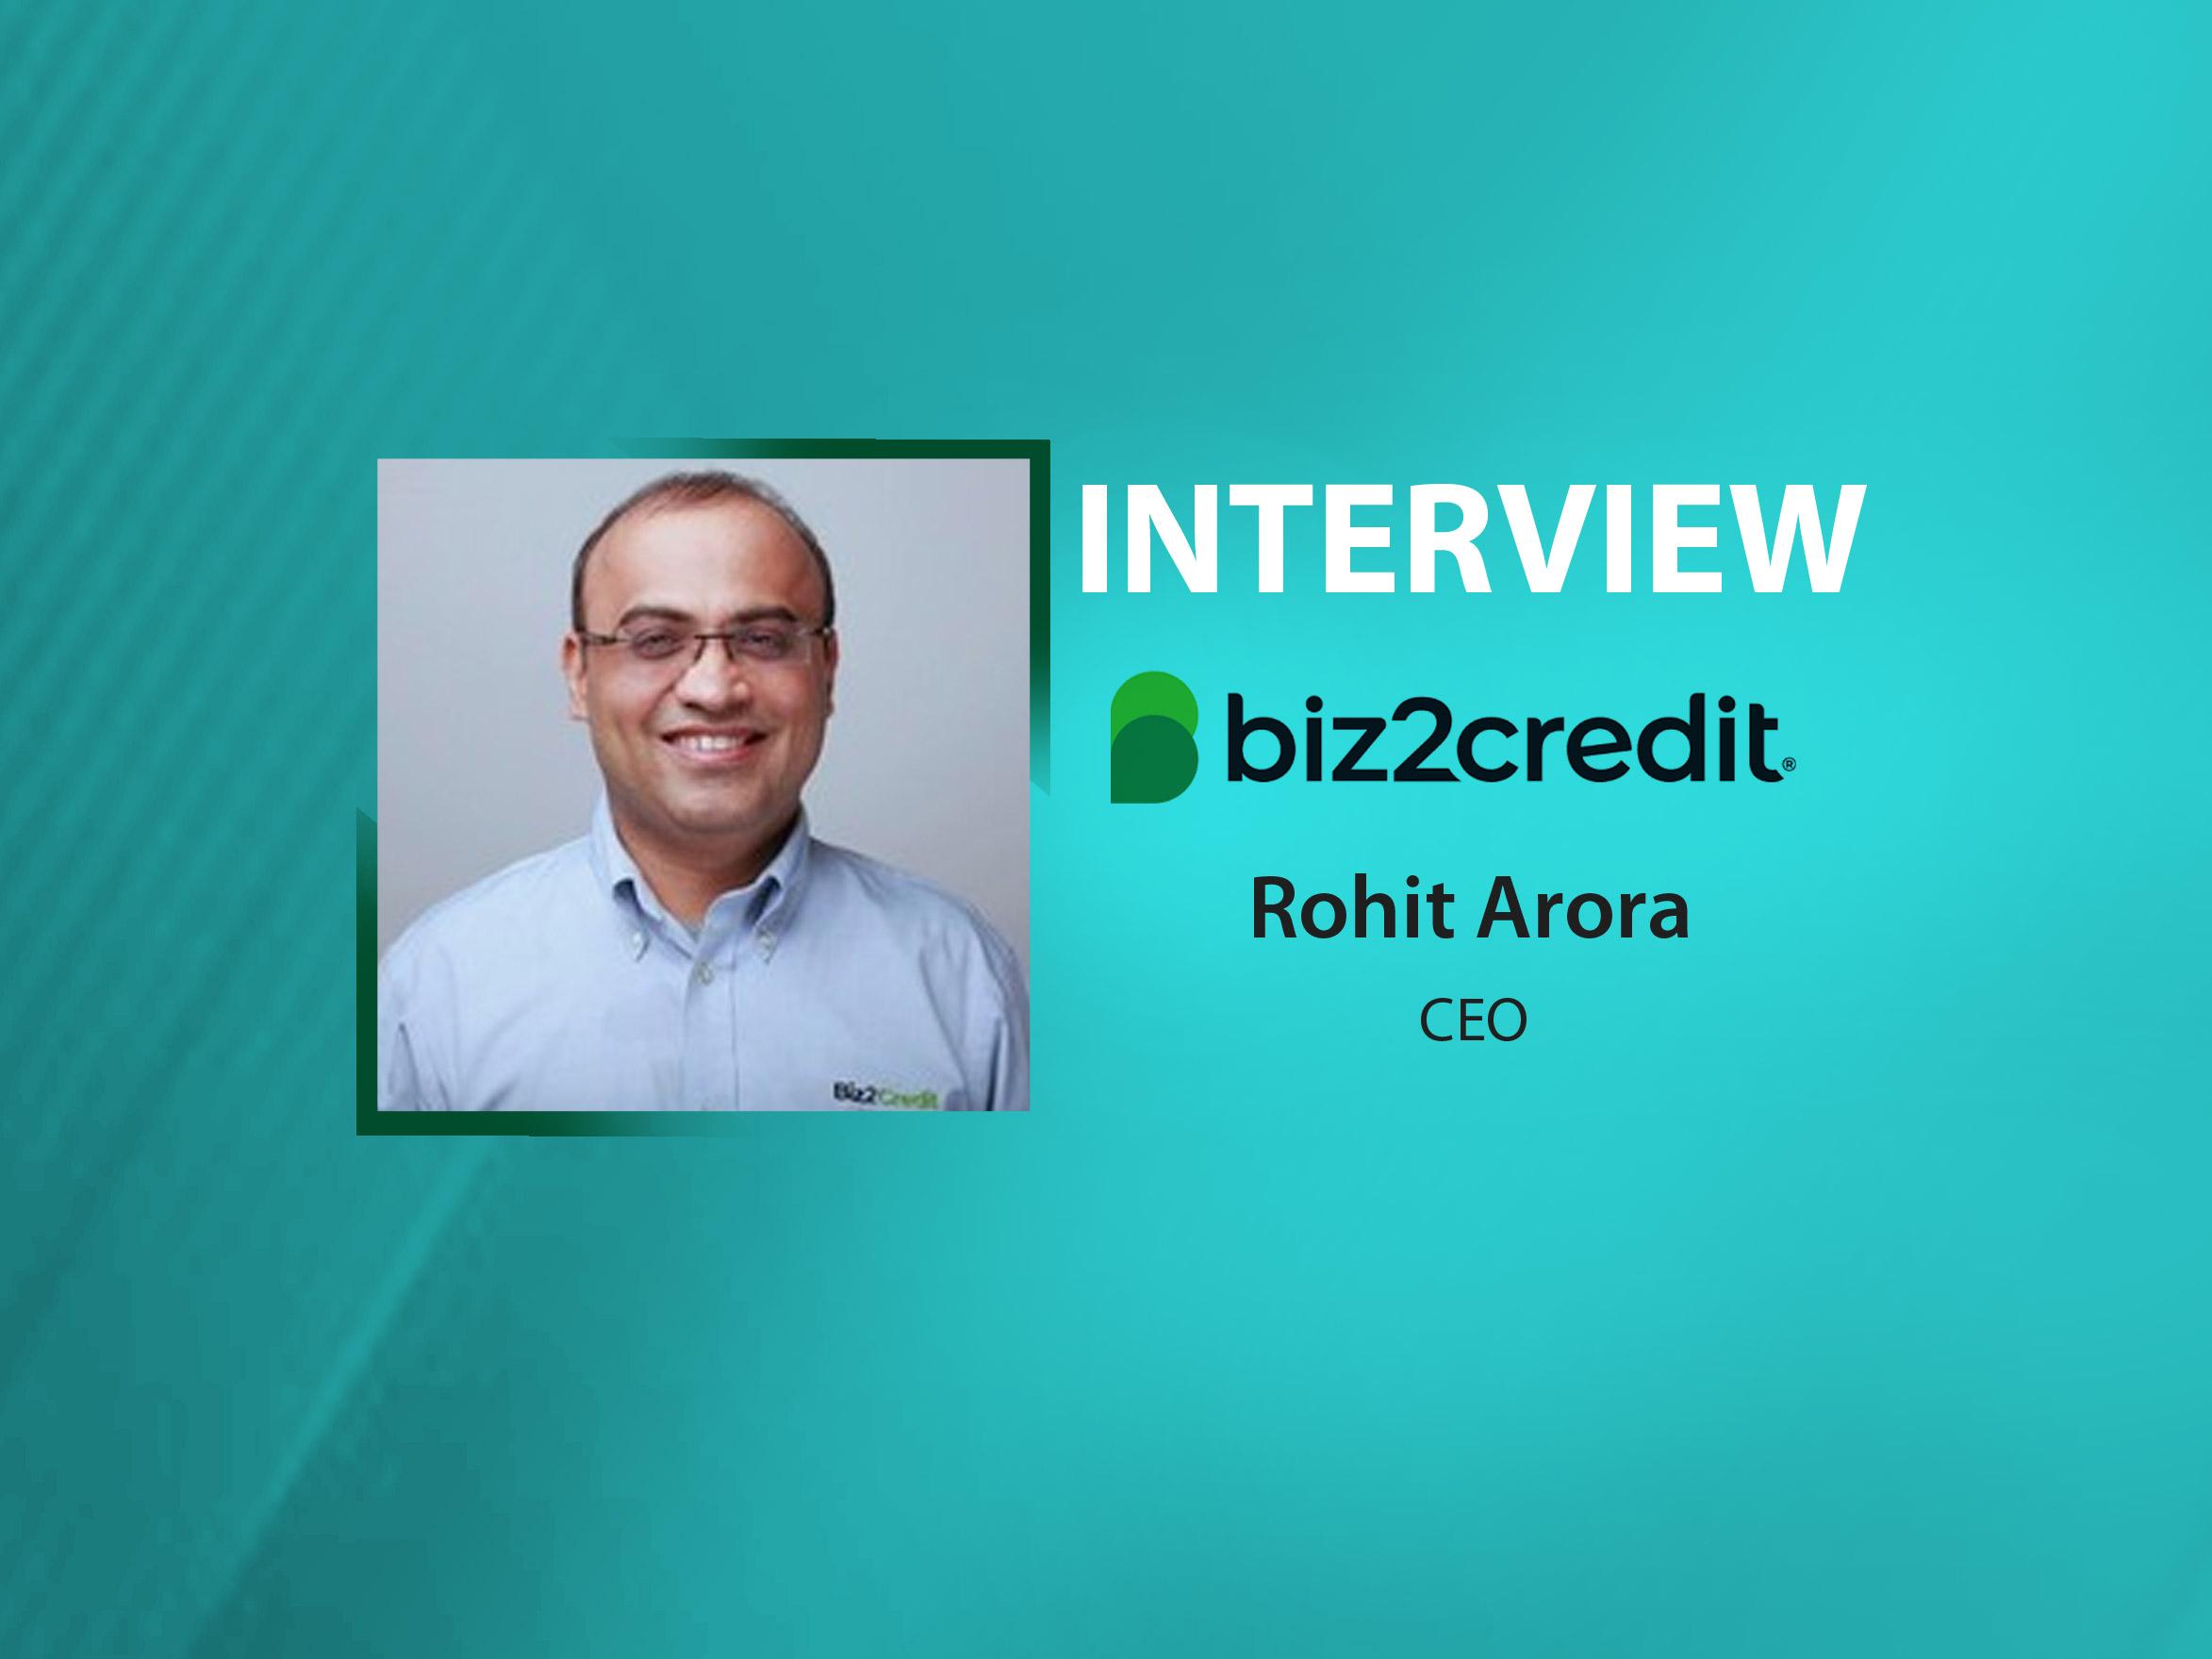 GlobalFintechSeries Interview with Rohit Arora, CEO at Biz2Credit